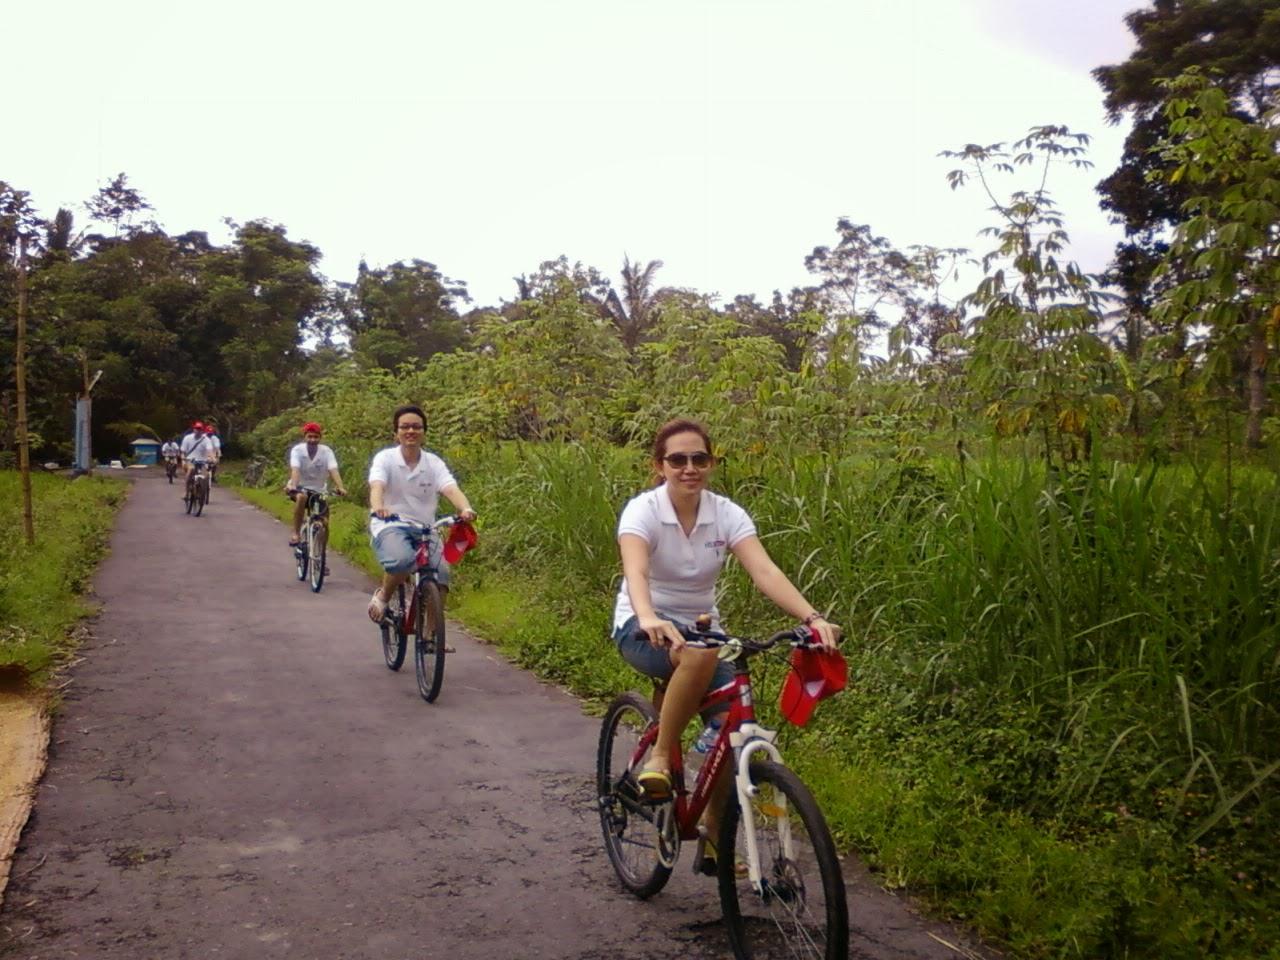 Asyiknya Bersepeda Di Desa Wisata Pentingsari Yogyakarta